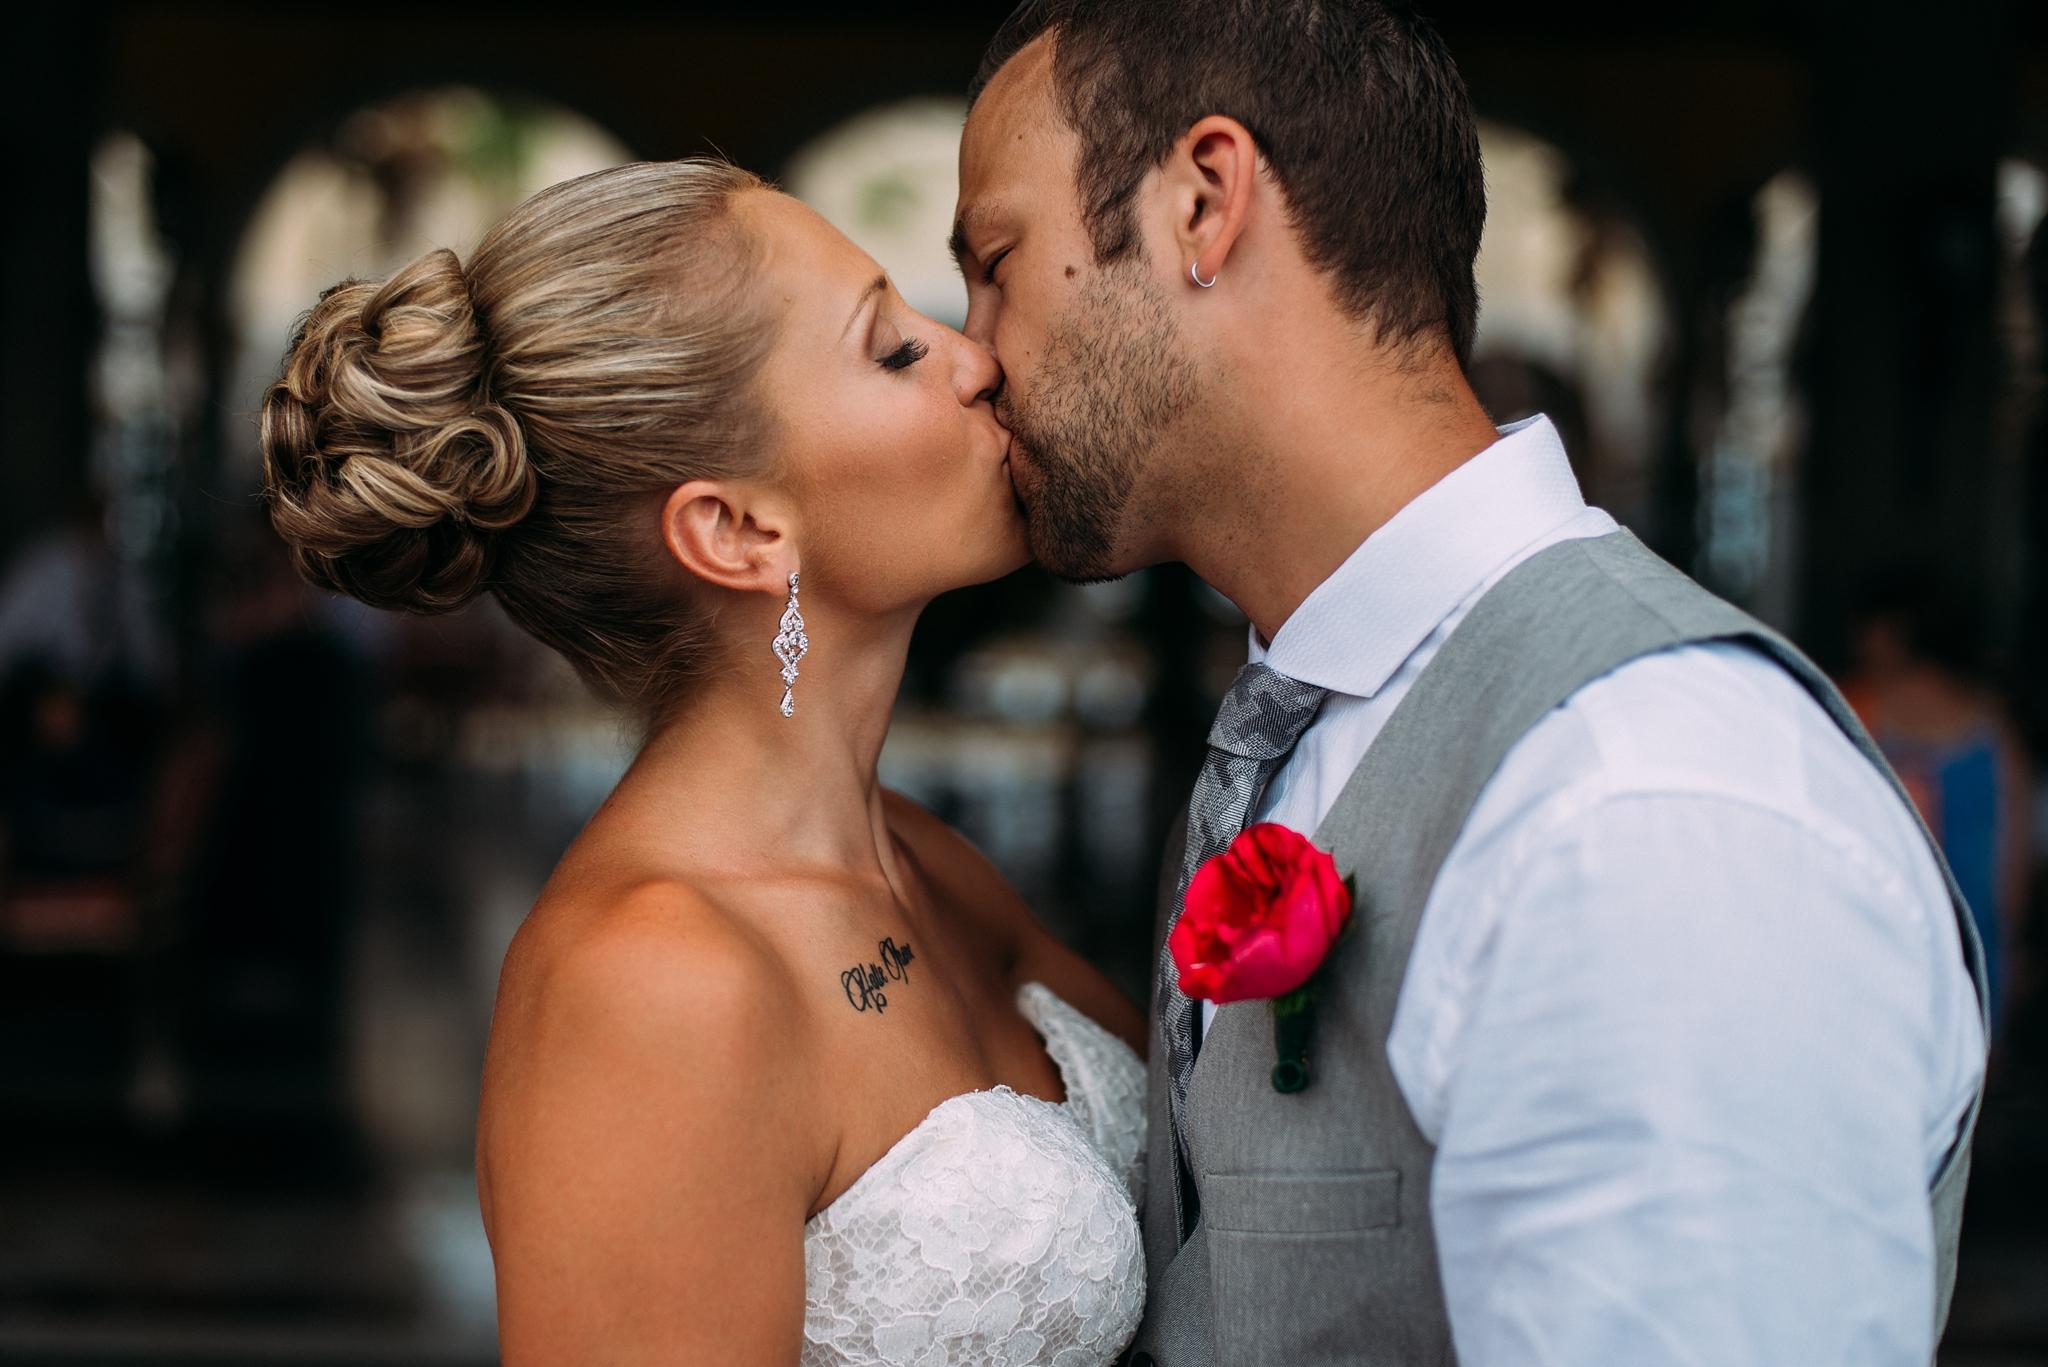 kaihla_tonai_intimate_wedding_elopement_photographer_1377